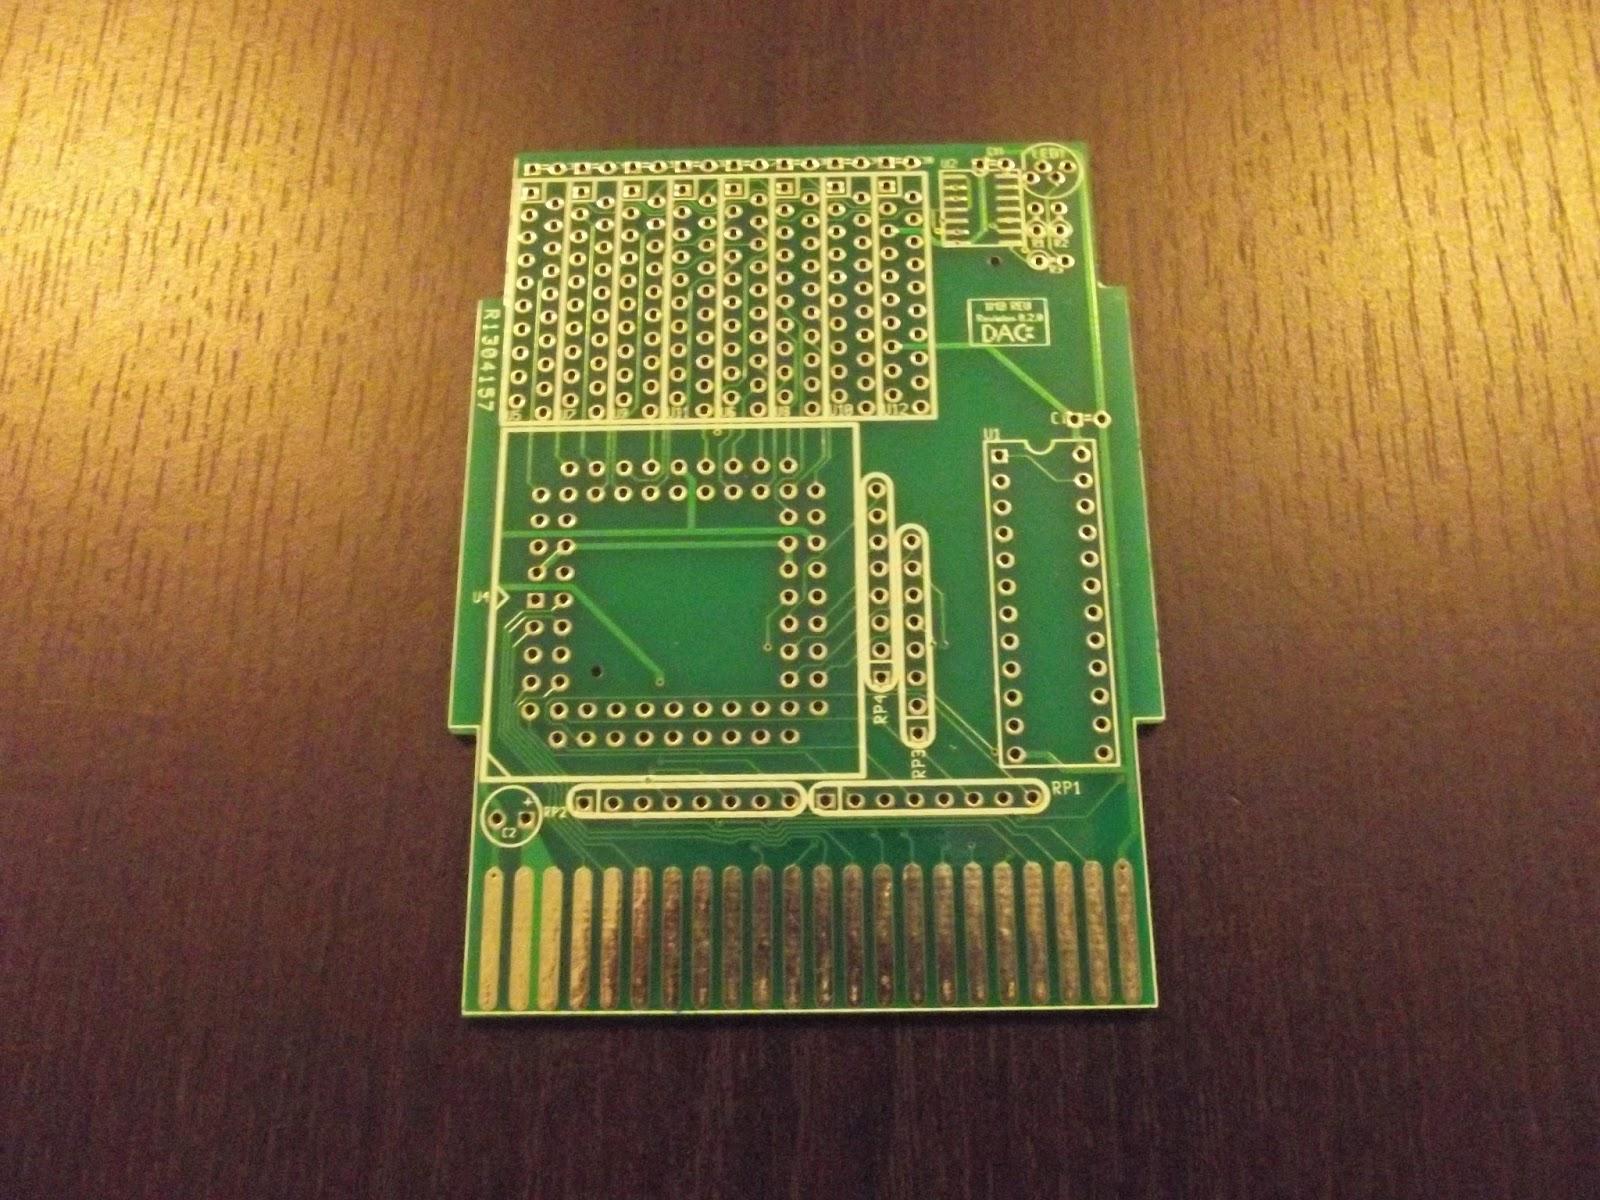 Just In - 1MB REU Clones   The Shareware PLUS Commodore 64